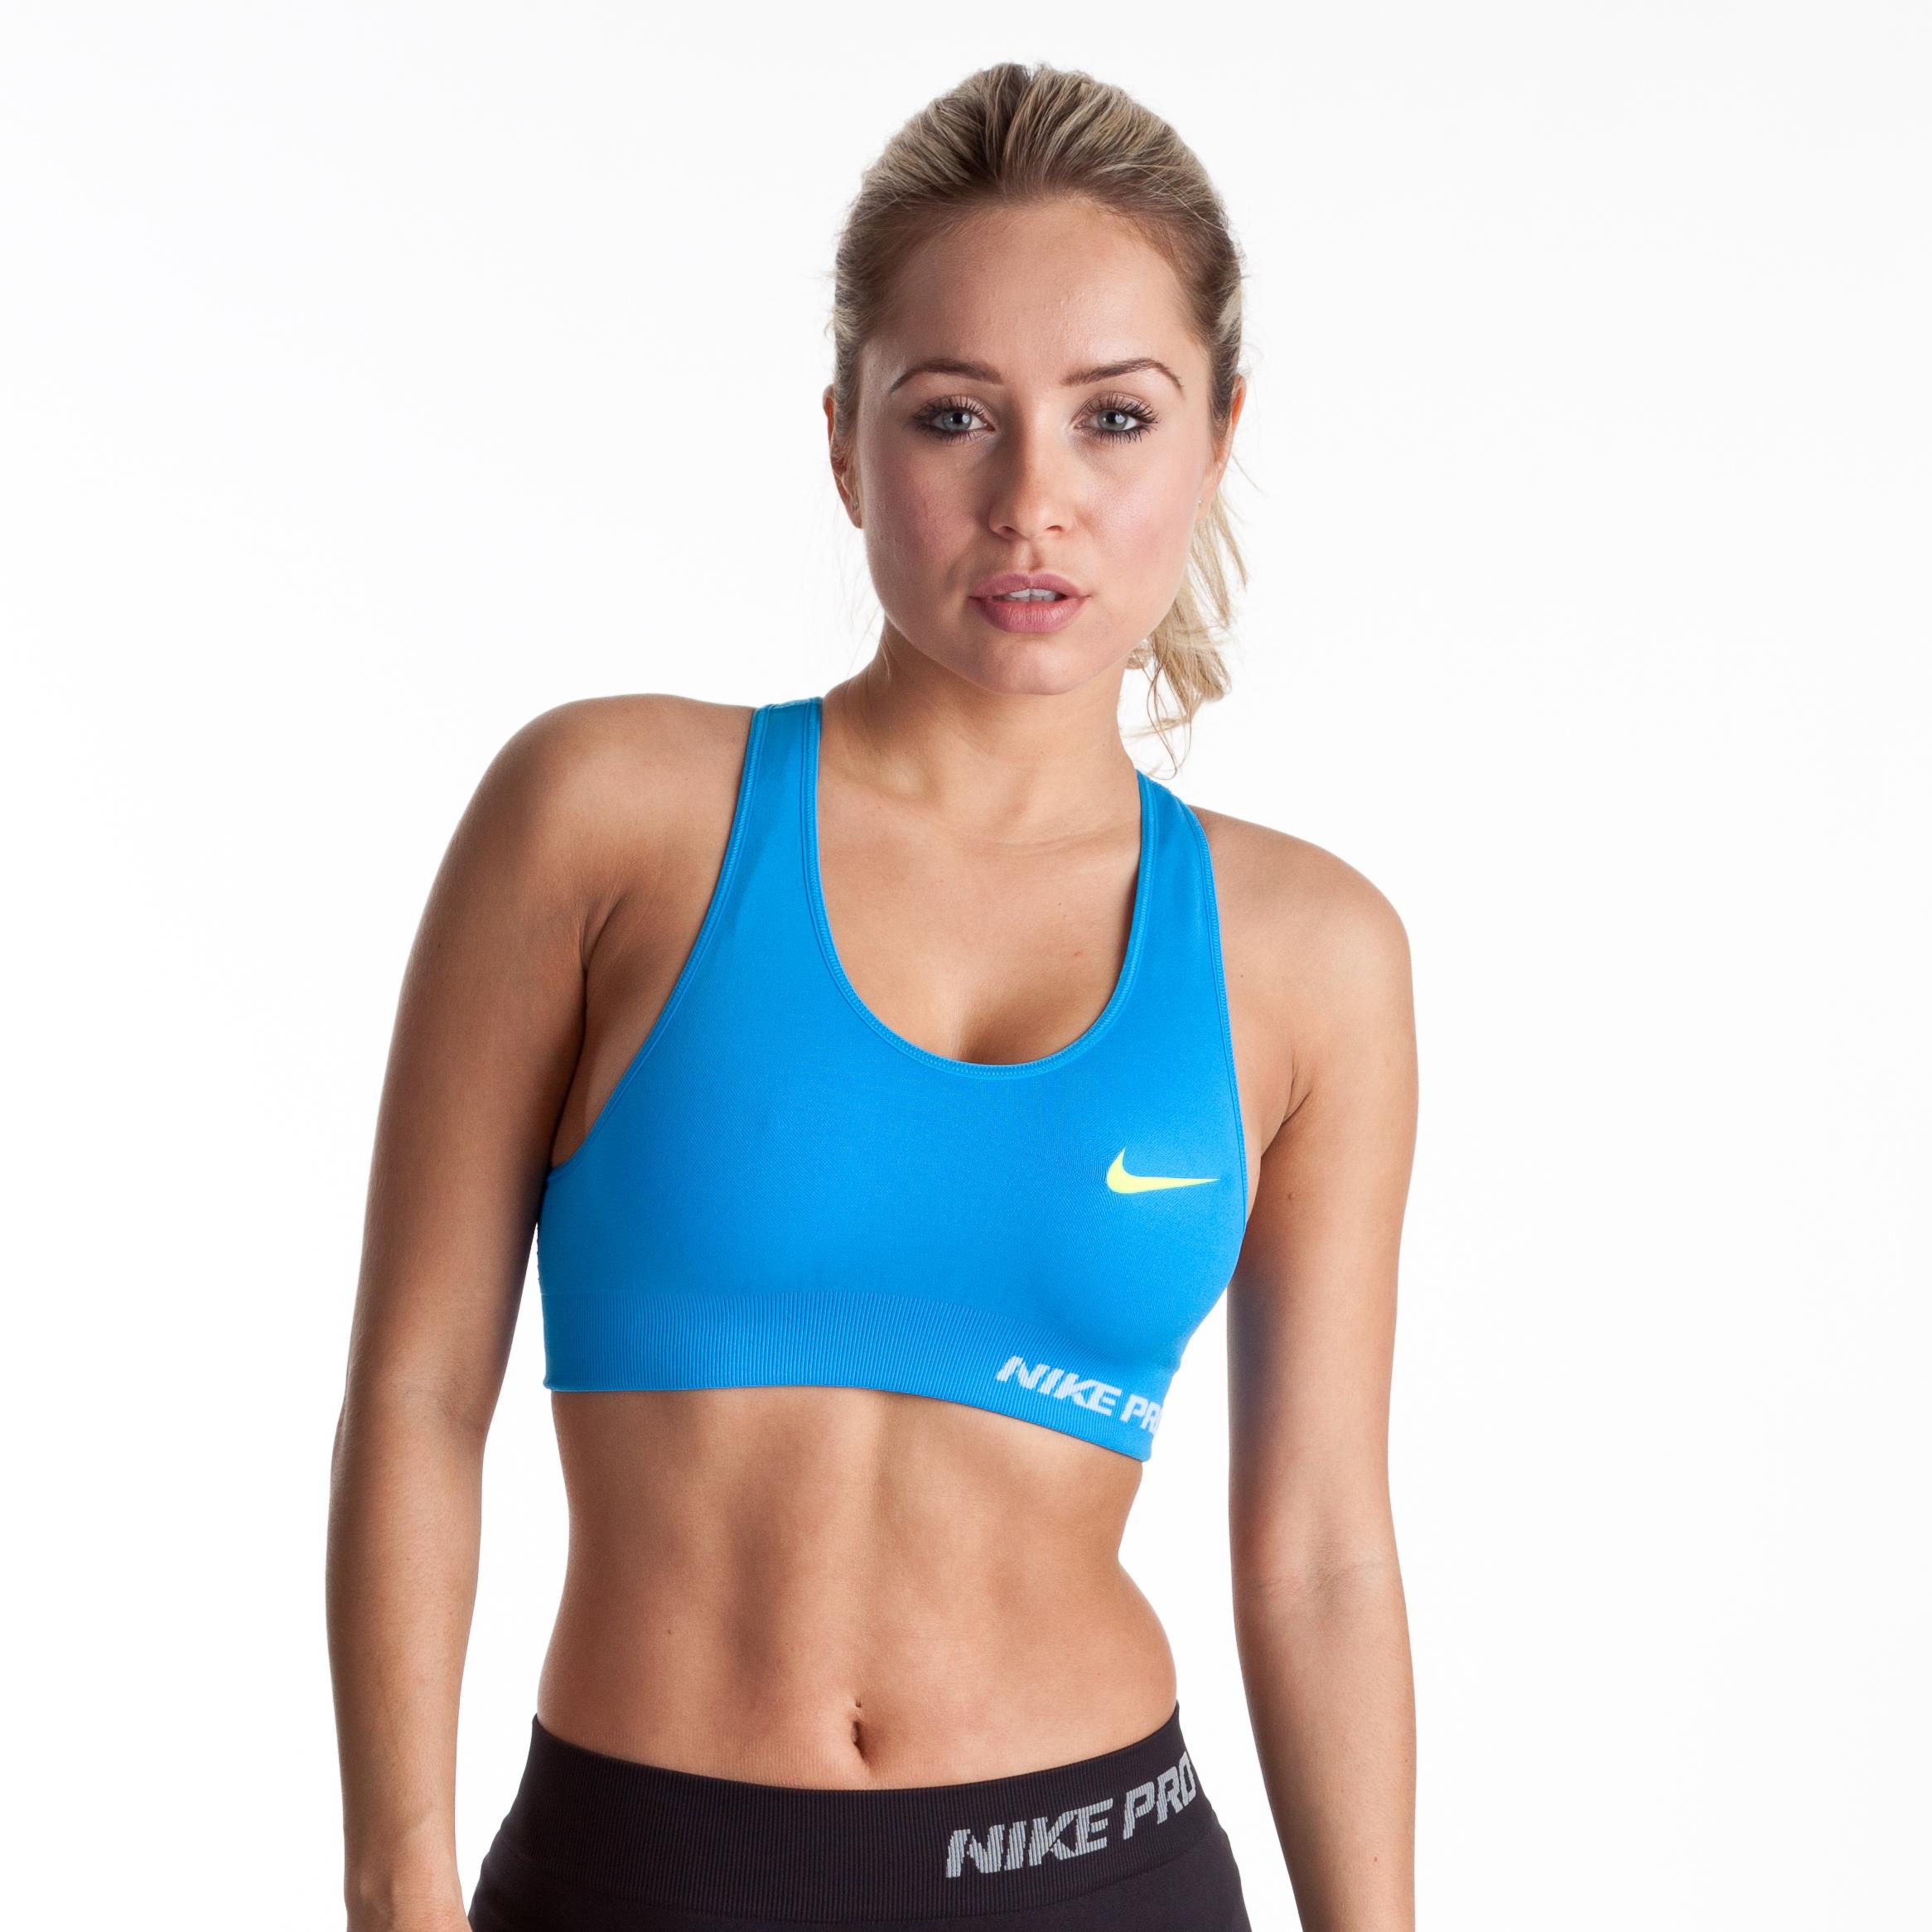 Nike Pro Limitless Bra - Blue Glow/Volt - Womens